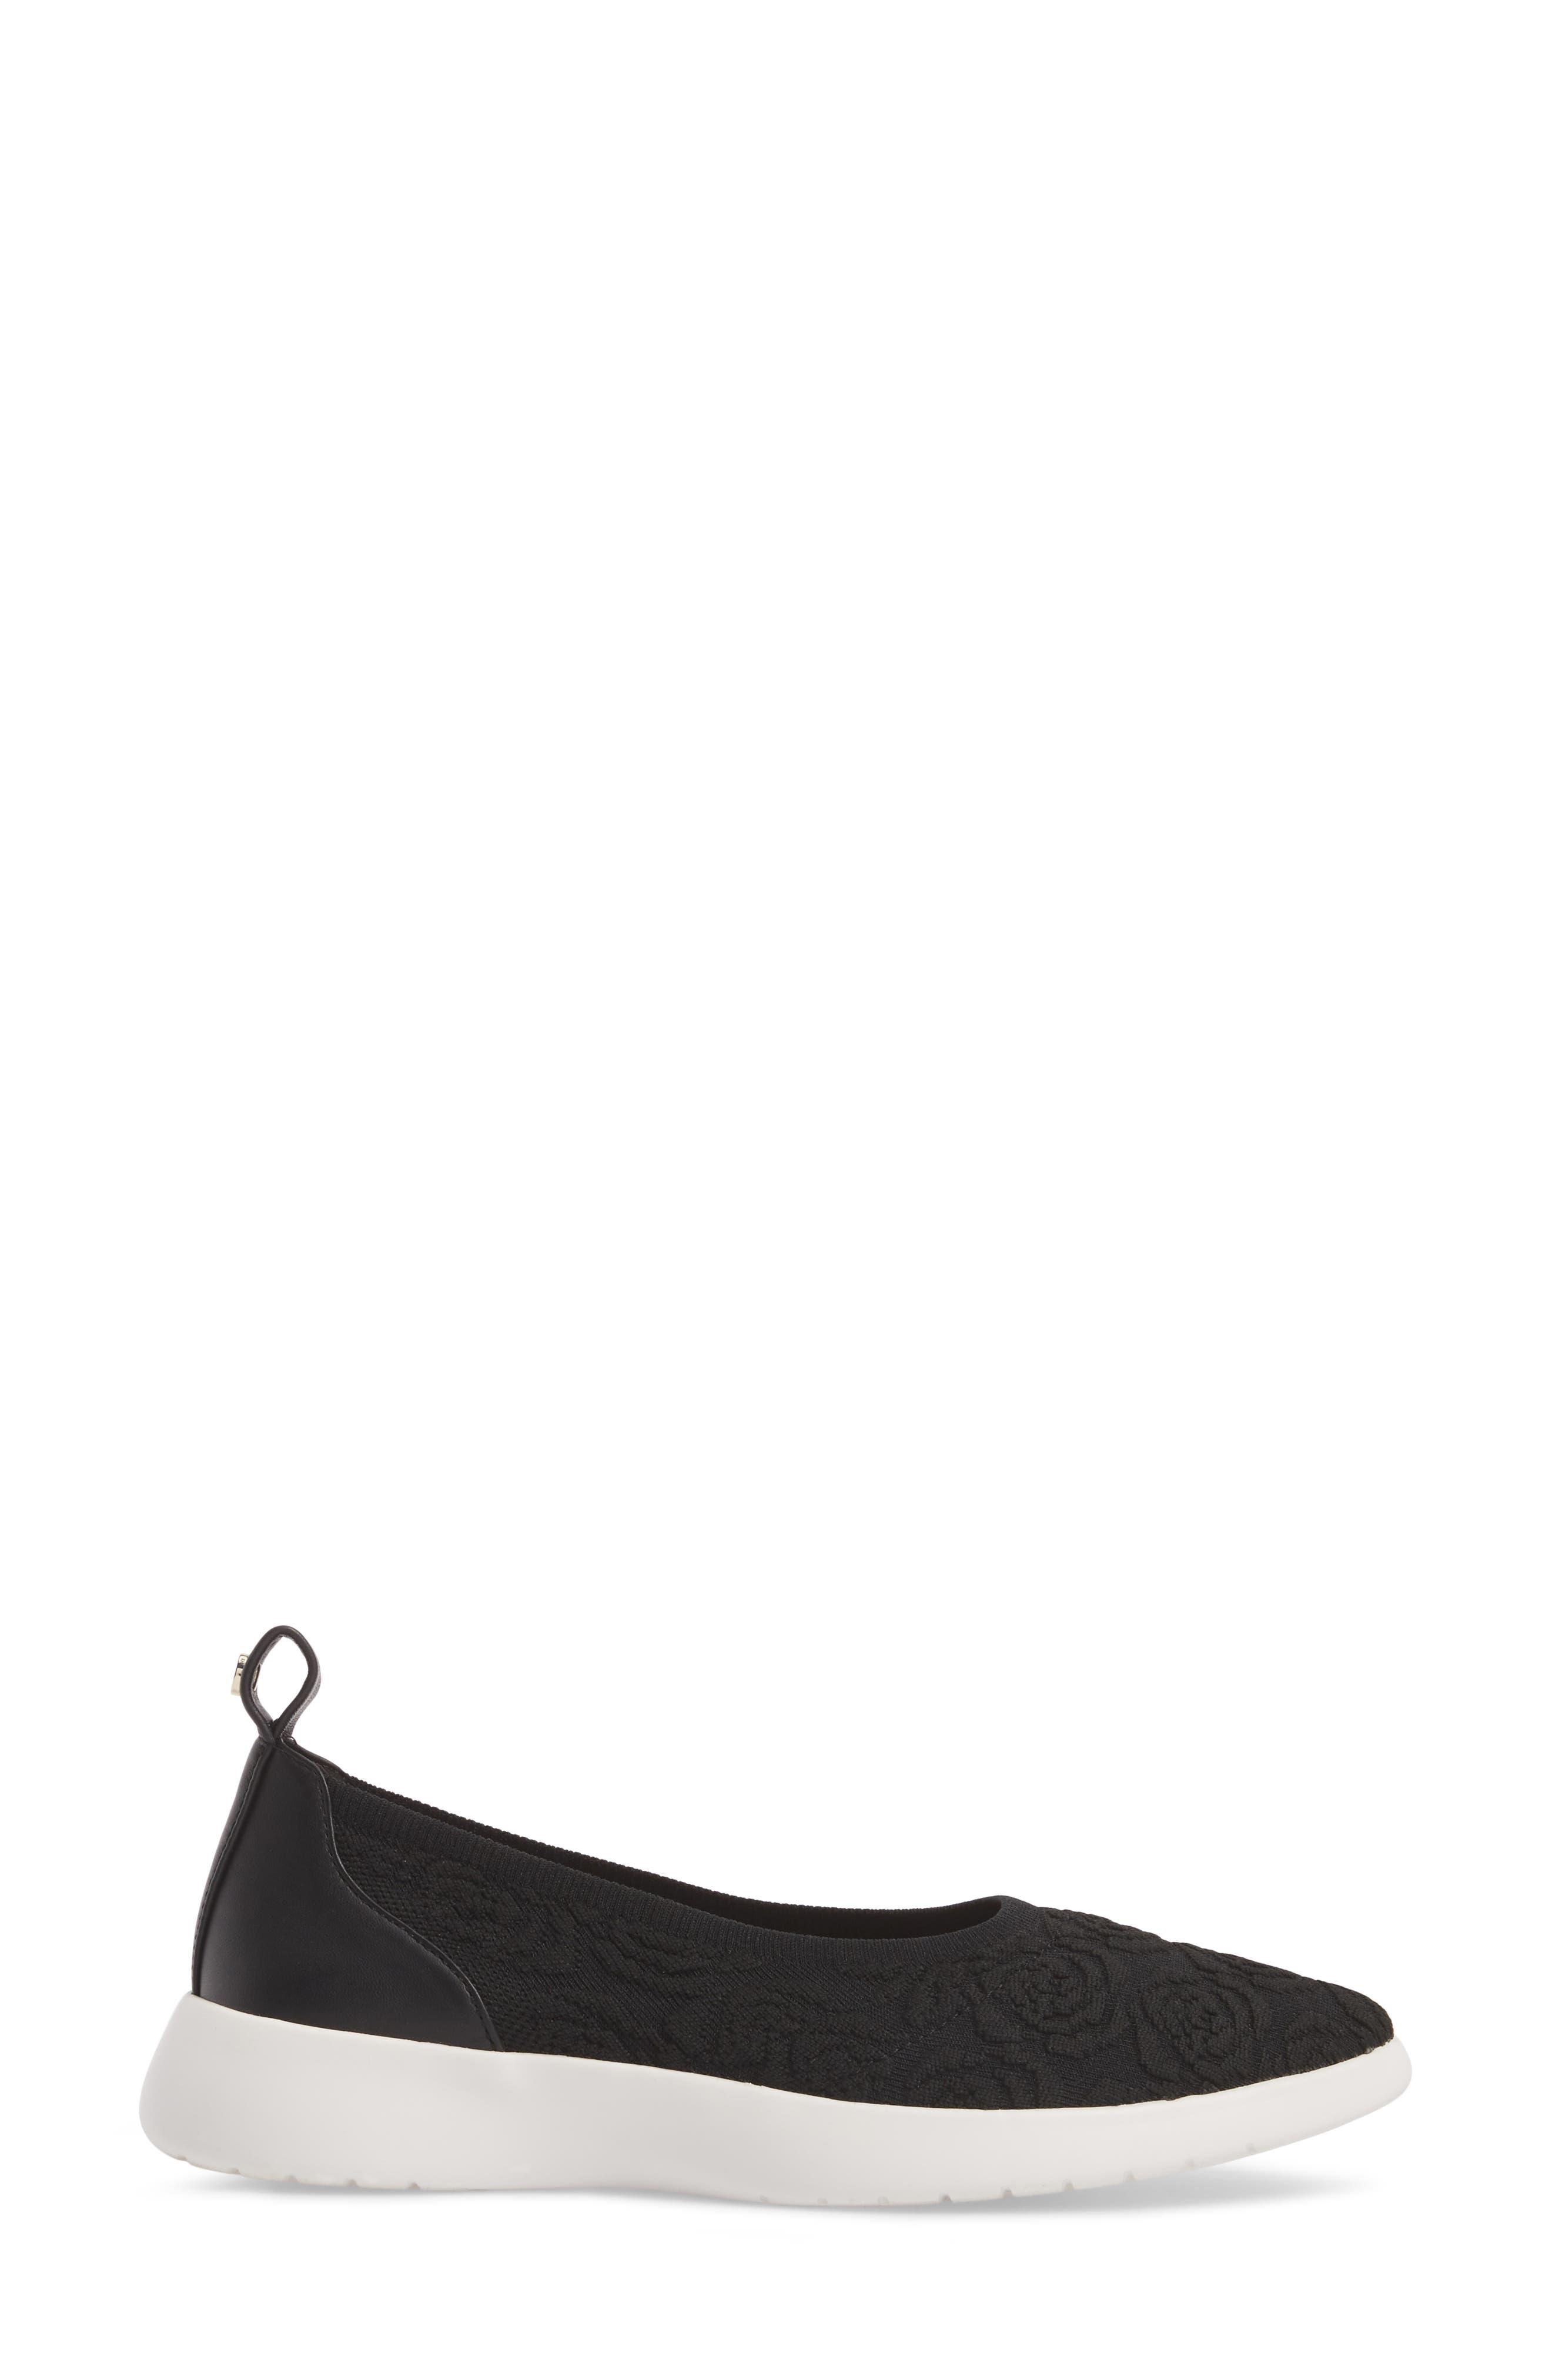 Daisy Flat,                             Alternate thumbnail 3, color,                             Black Knit Fabric